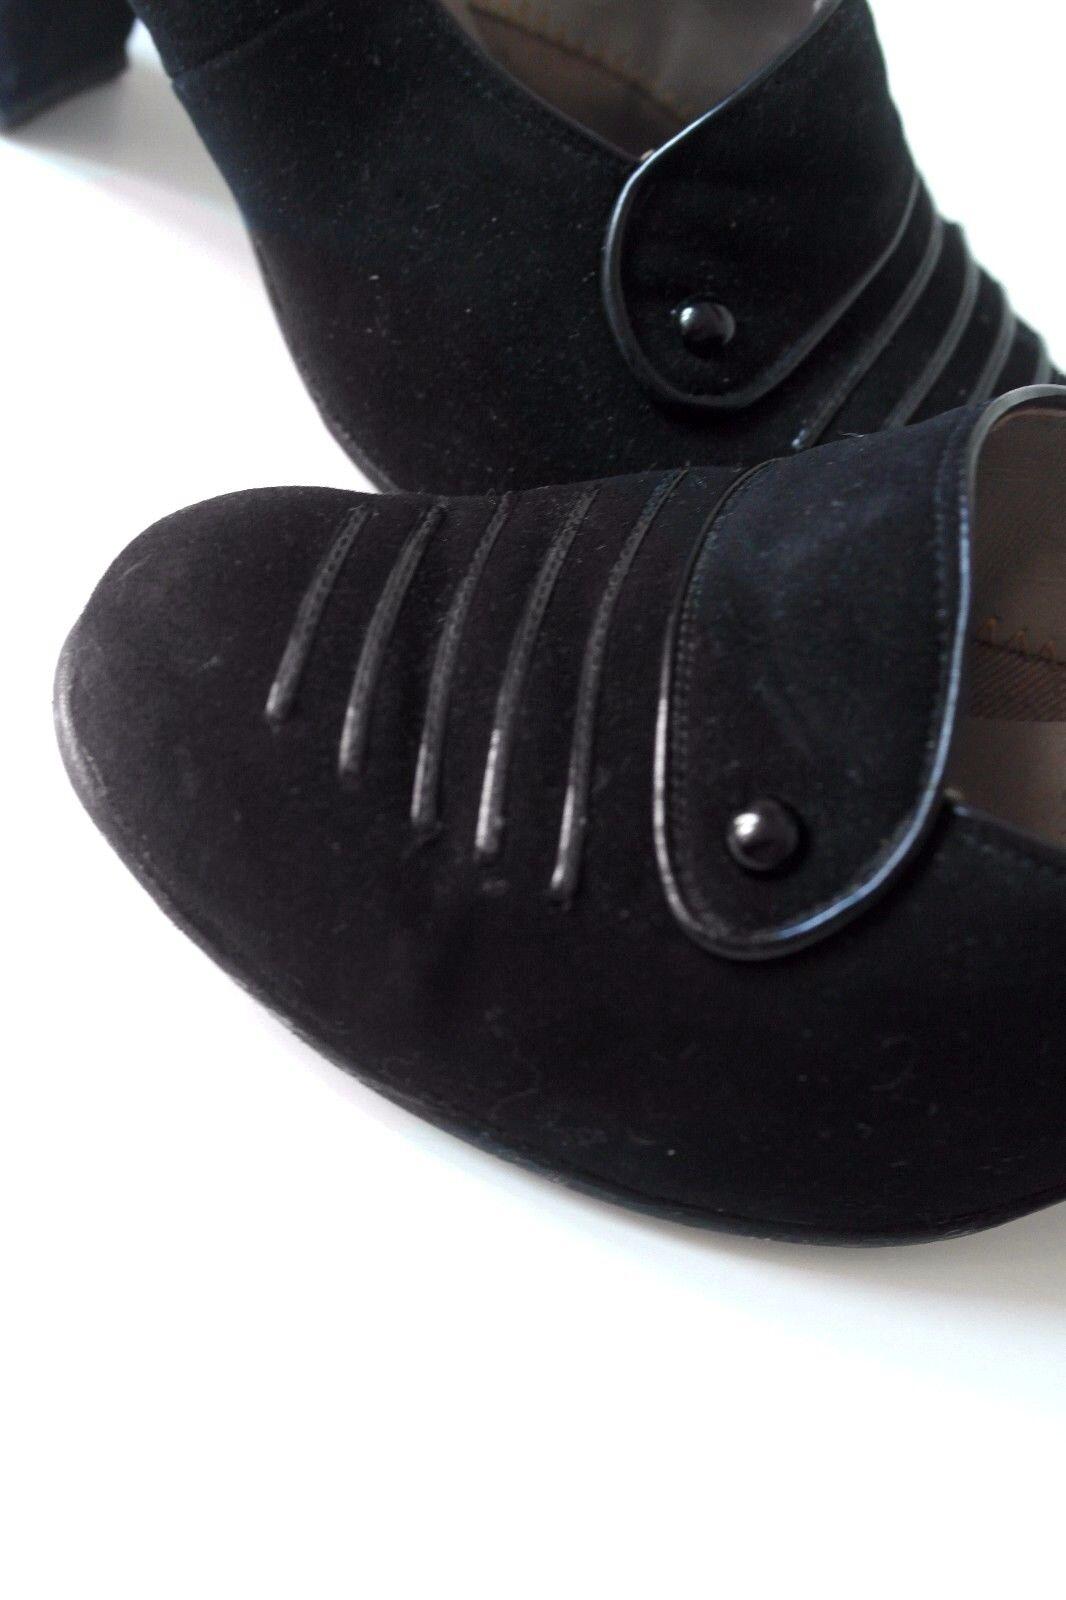 IRUS Damen Pumps Schuhe 50er TRUE VINTAGE VINTAGE VINTAGE UK 5 Veloursleder schwarz EUR 38 60s aef1f8